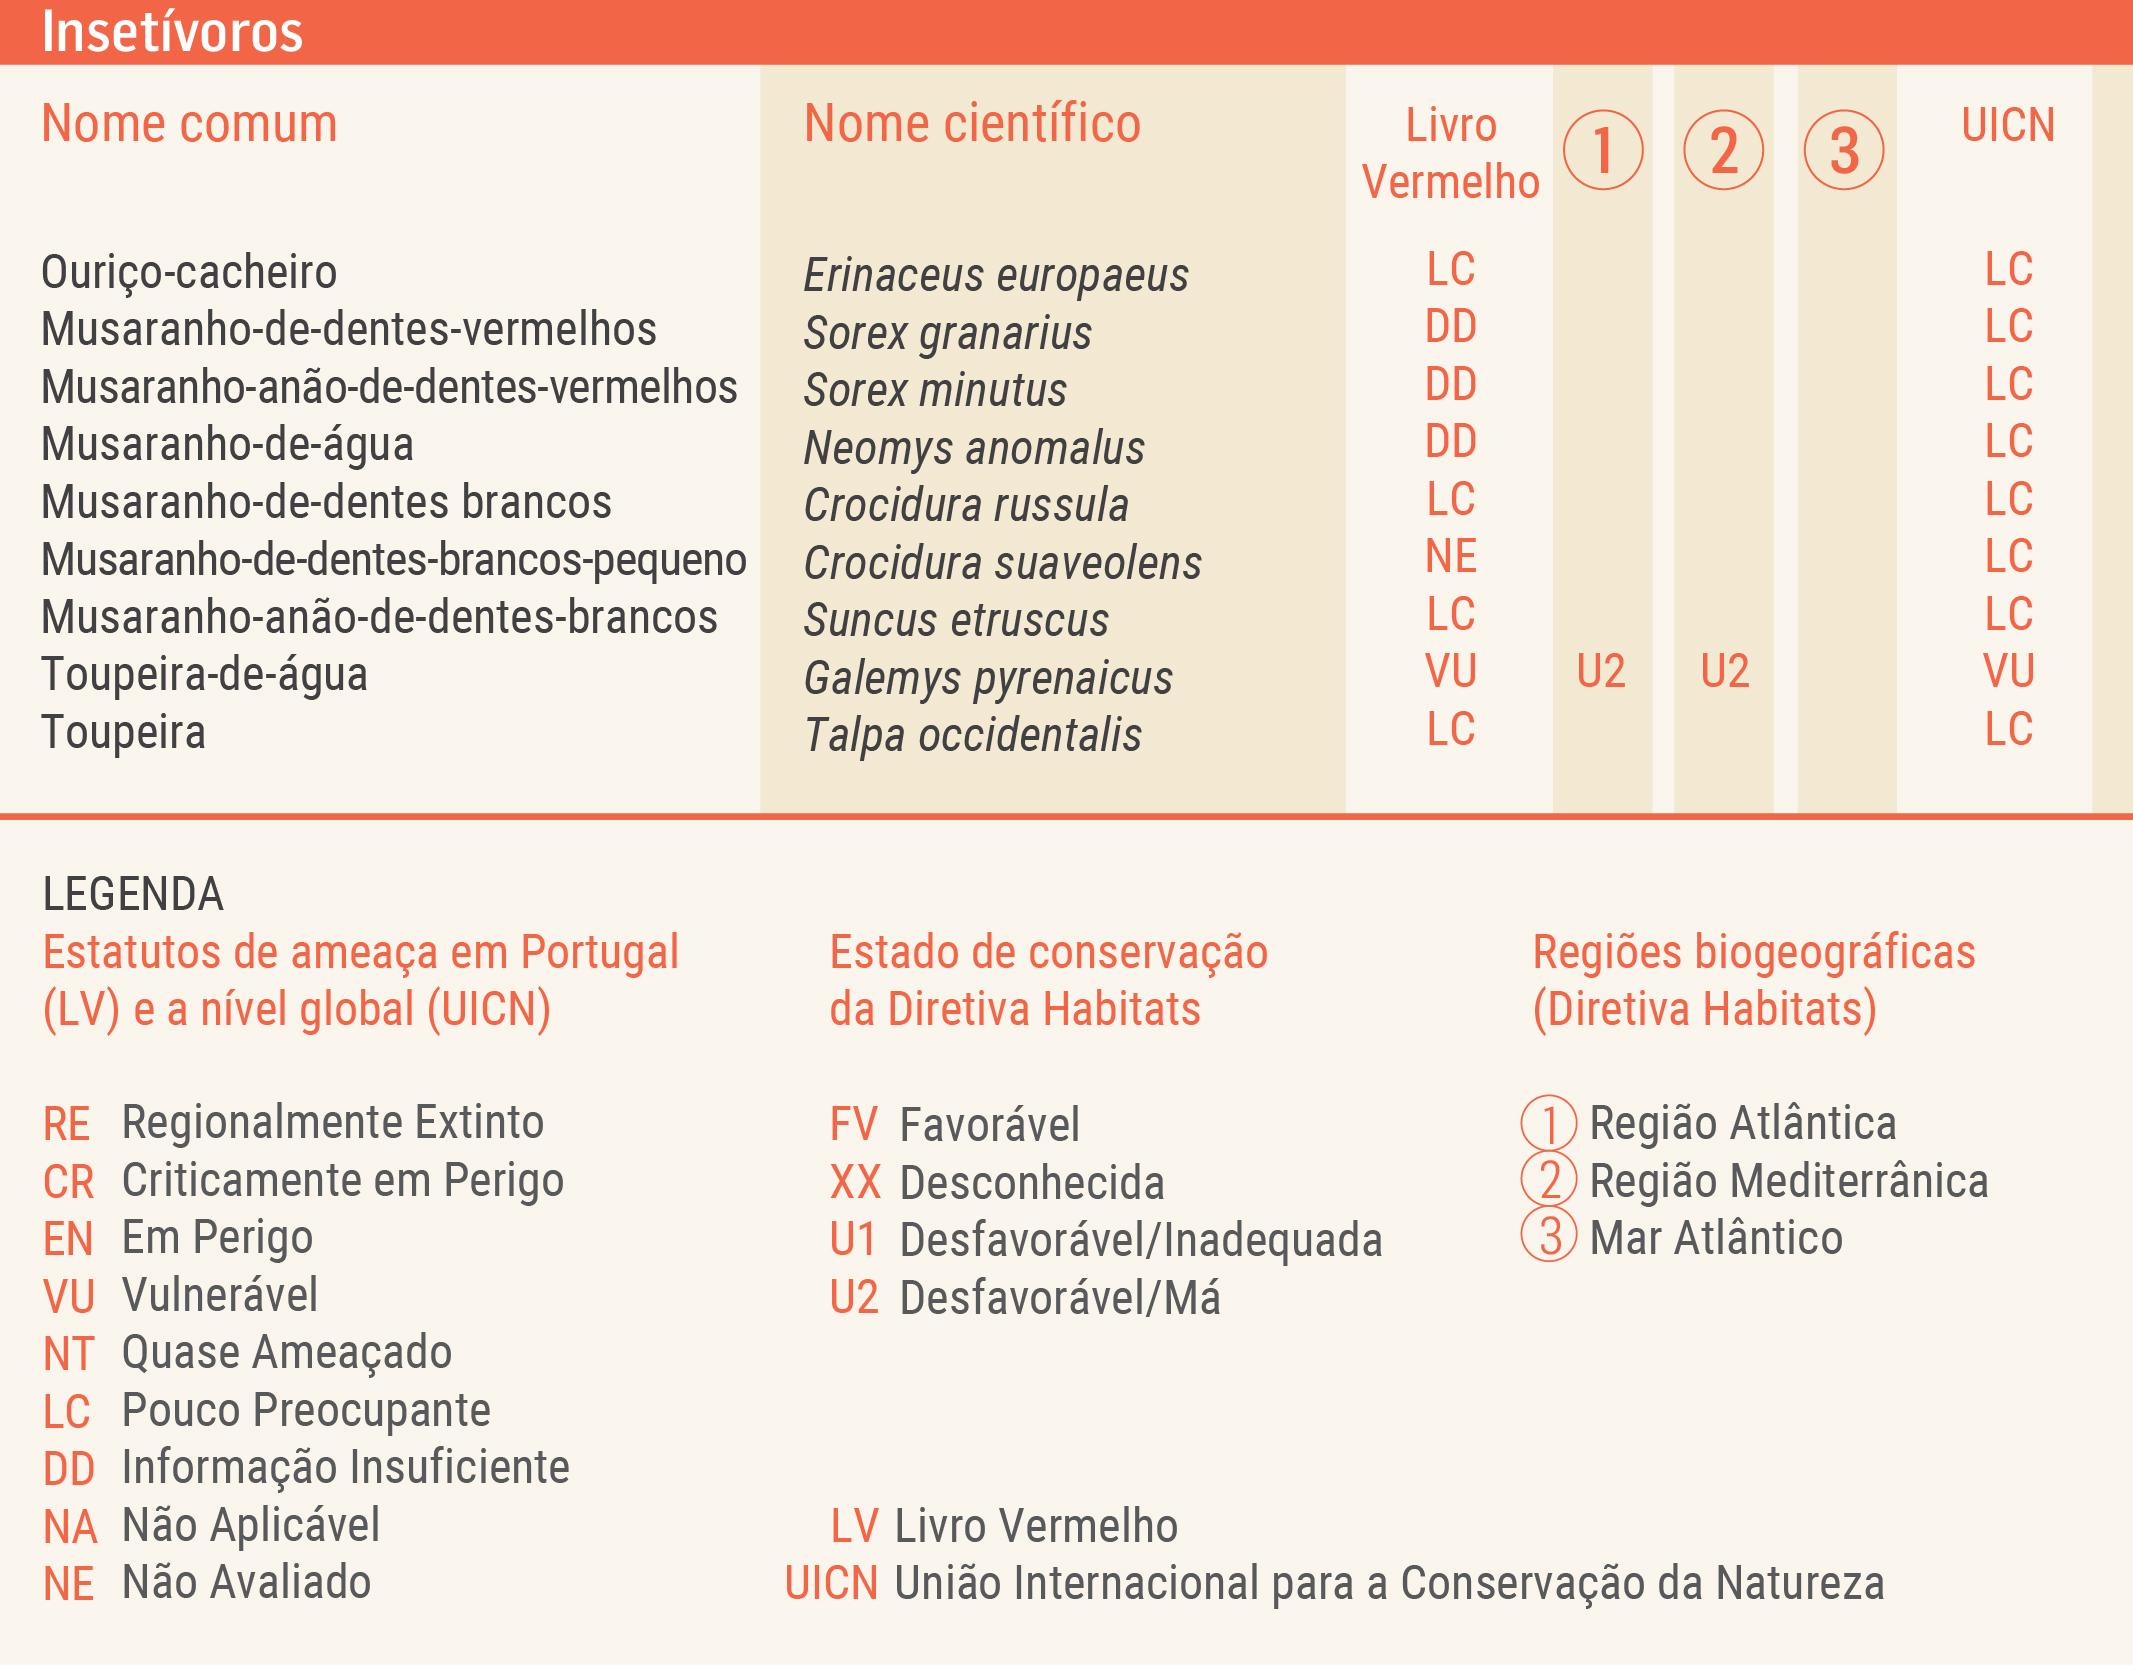 Tabela dos estatutos